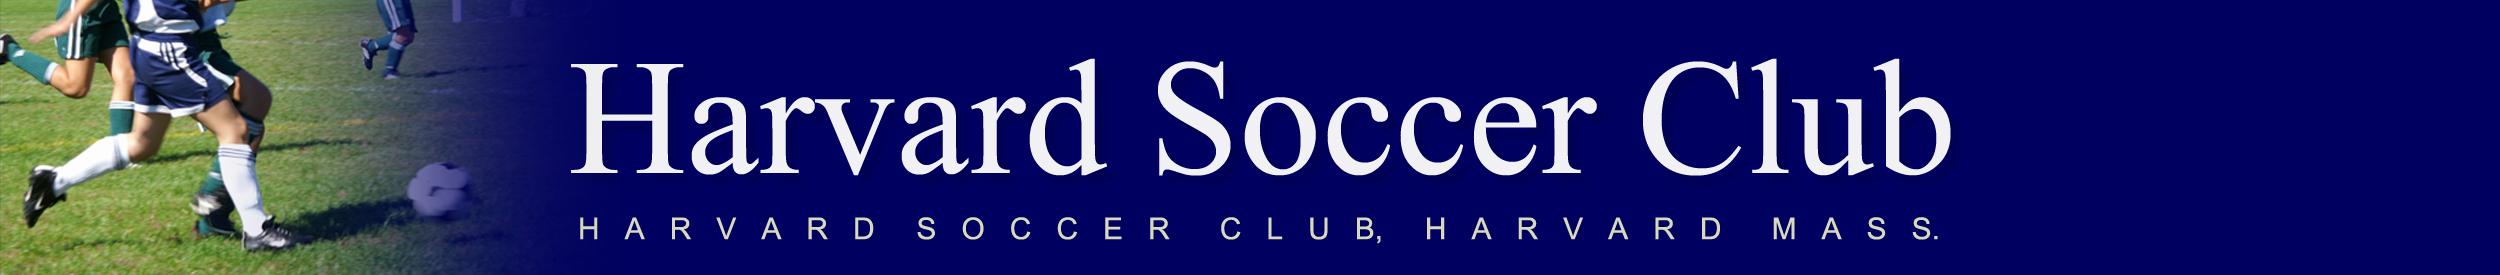 Harvard Soccer Club, Soccer, Goal, NVYSL Field